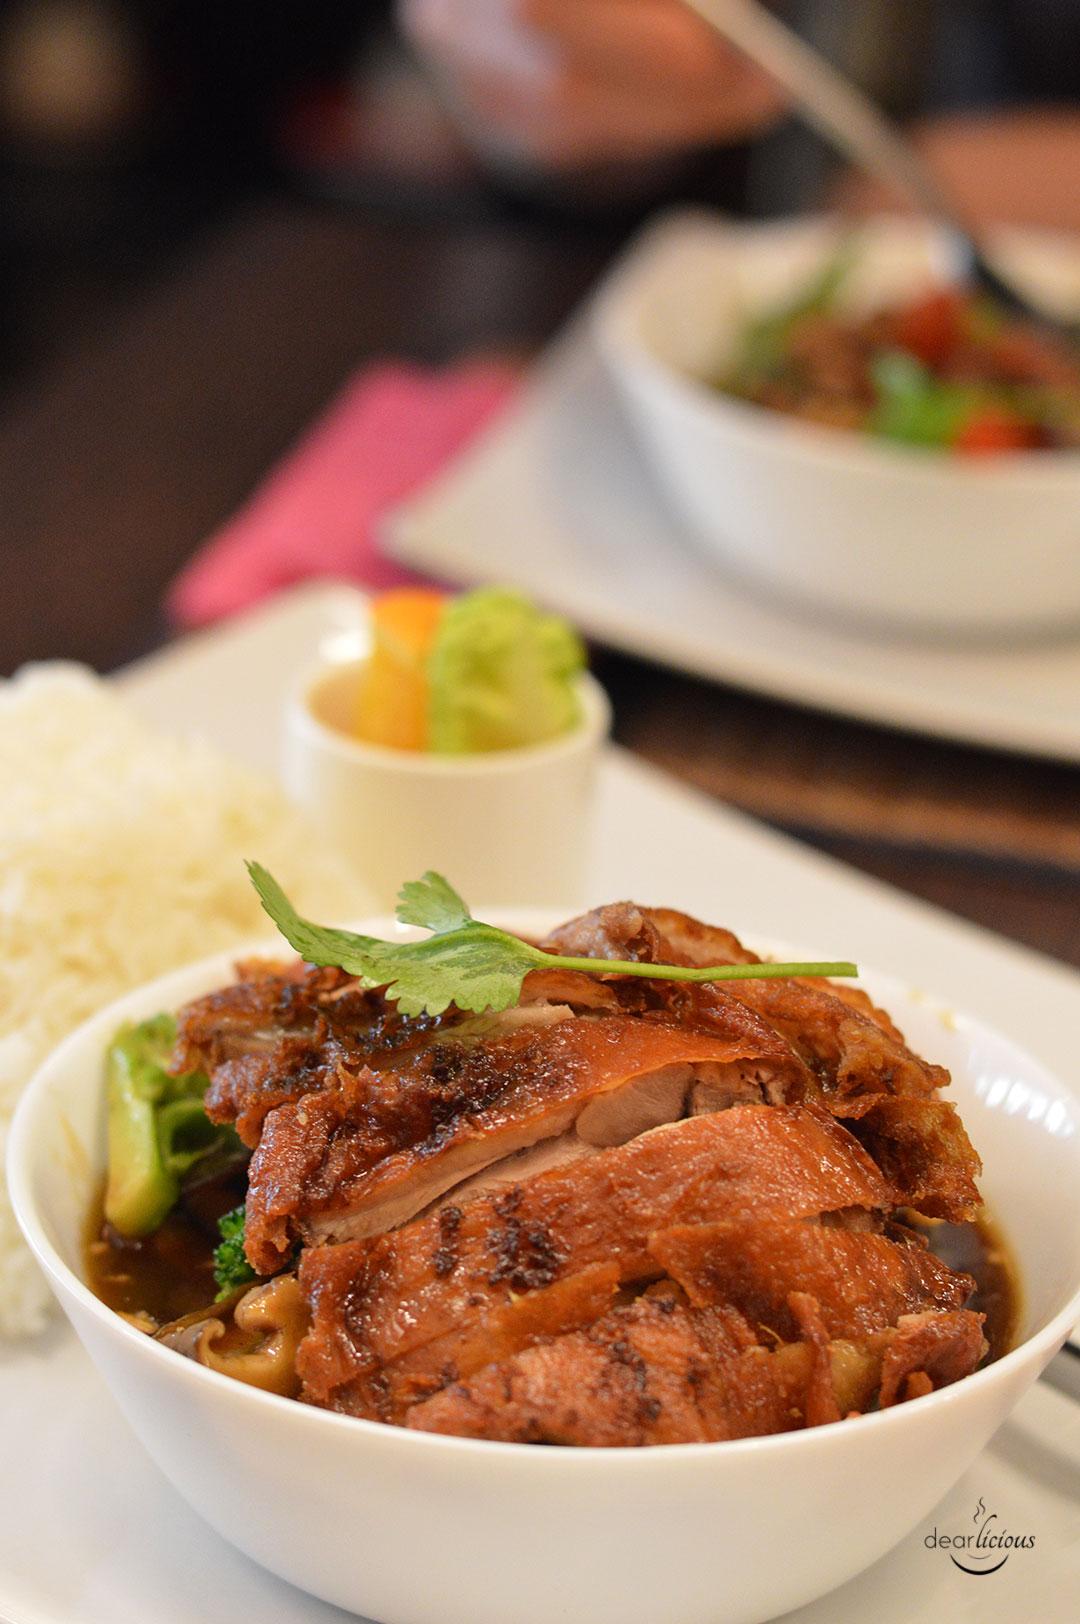 Banyan: Thai-Restaurant in Wiesbaden | www.dearliciouss.com